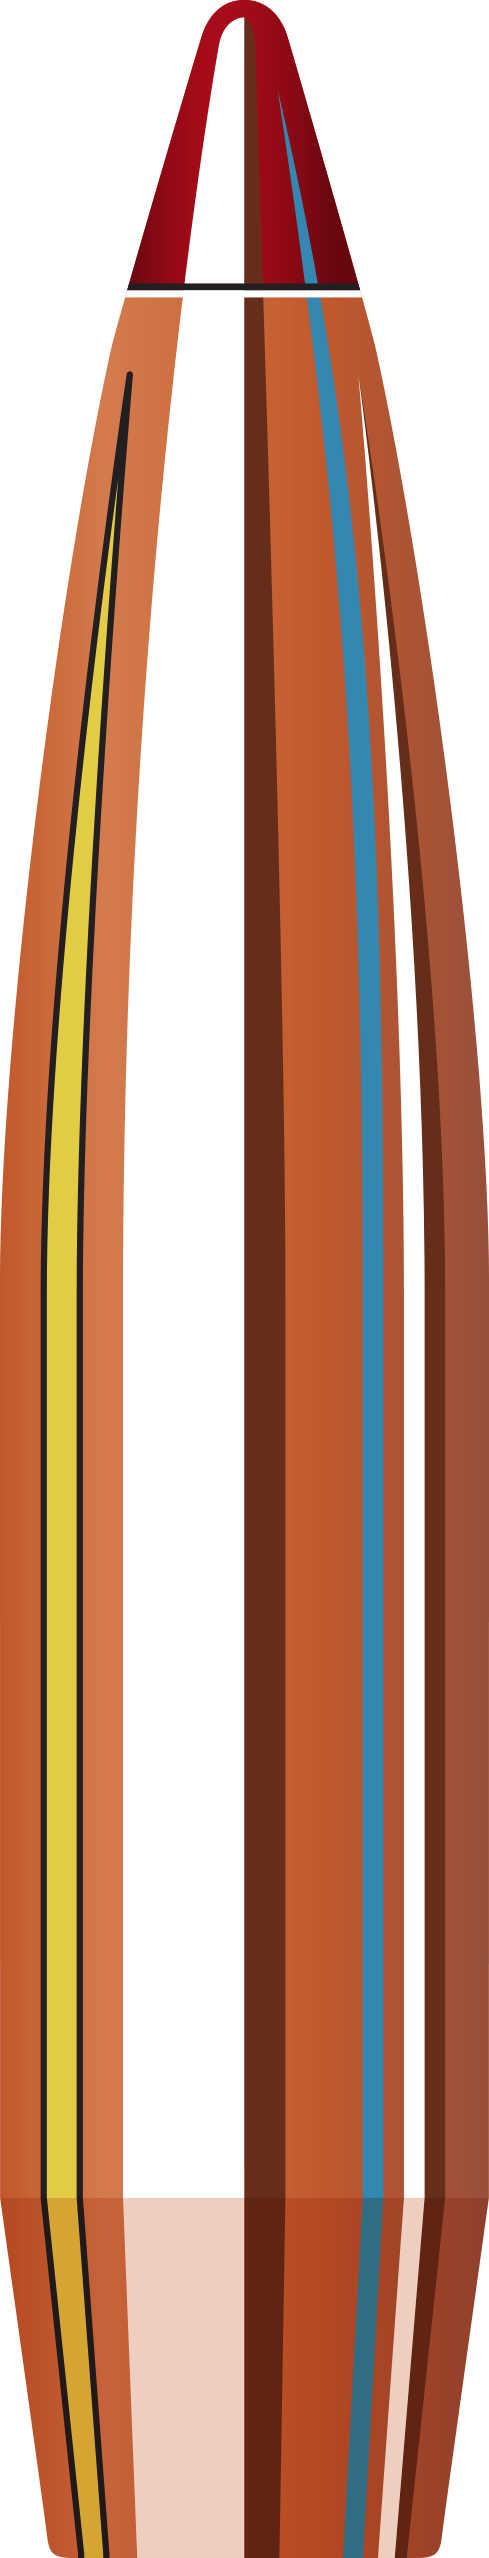 Hornady ELD Match Reloading Bullets 243 Caliber 108 Grain Boat Tail, 100  Per Box Md: 24561